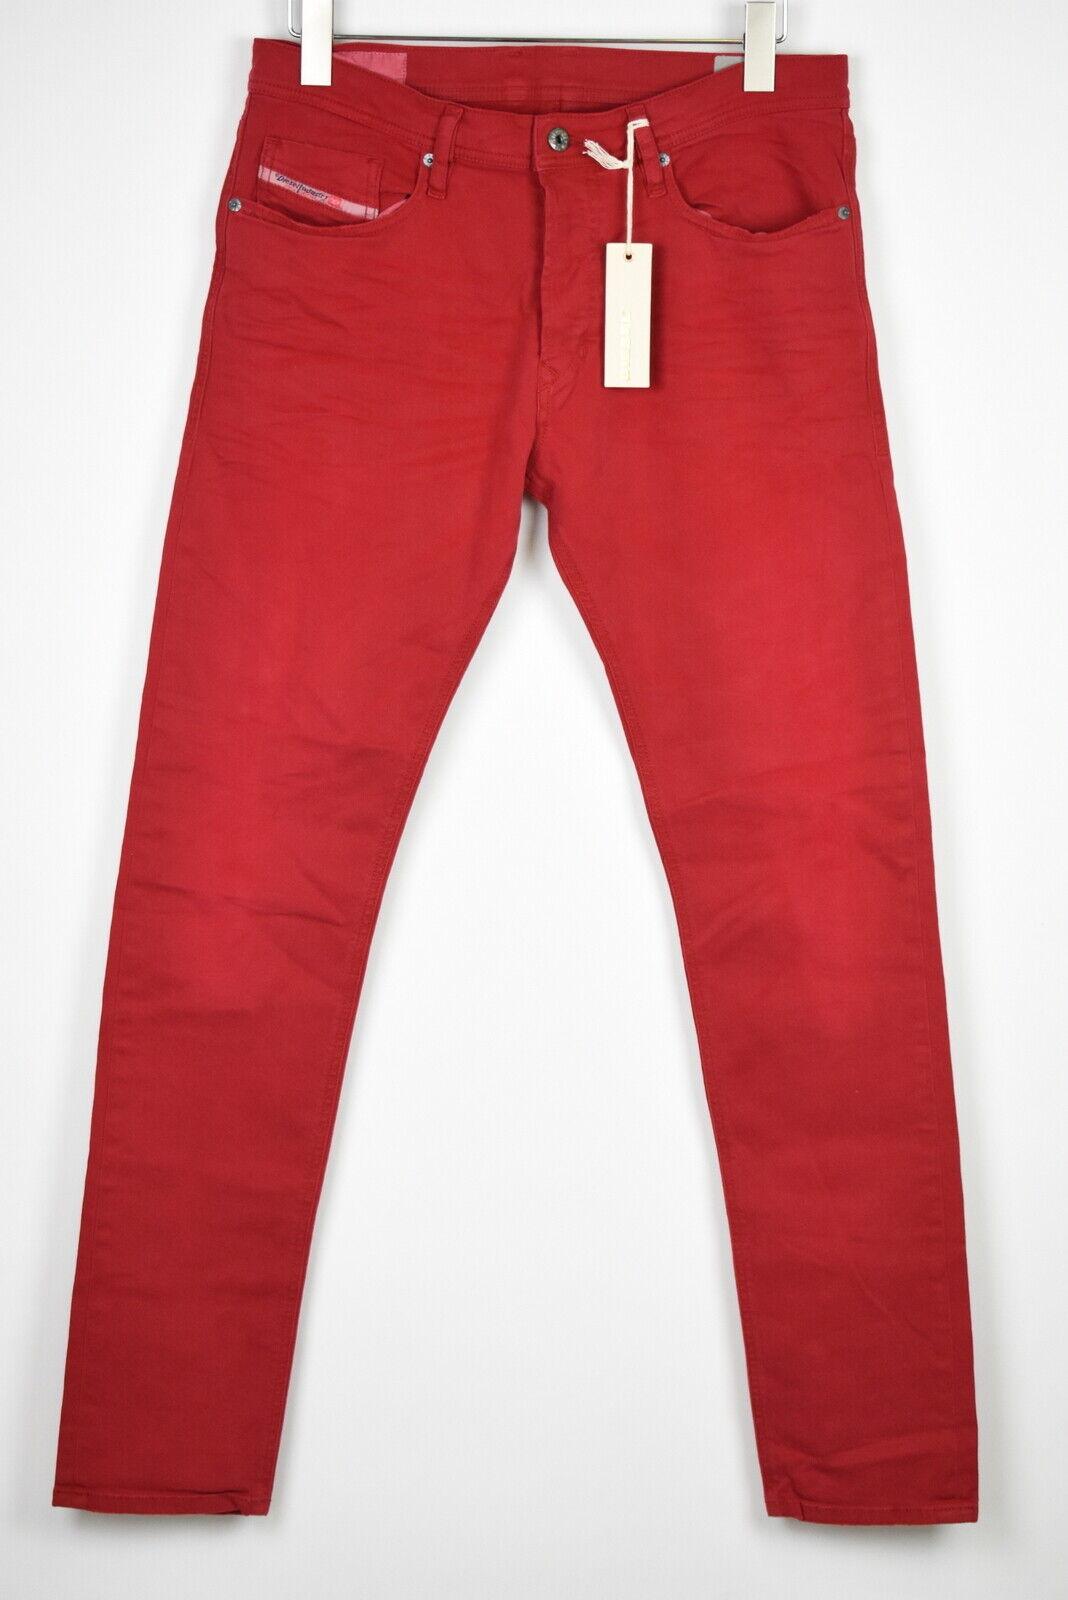 UVP 160 Diesel Tepphar 0111D Herren W31 Enganliegend Farbig Raw Jeans 14558